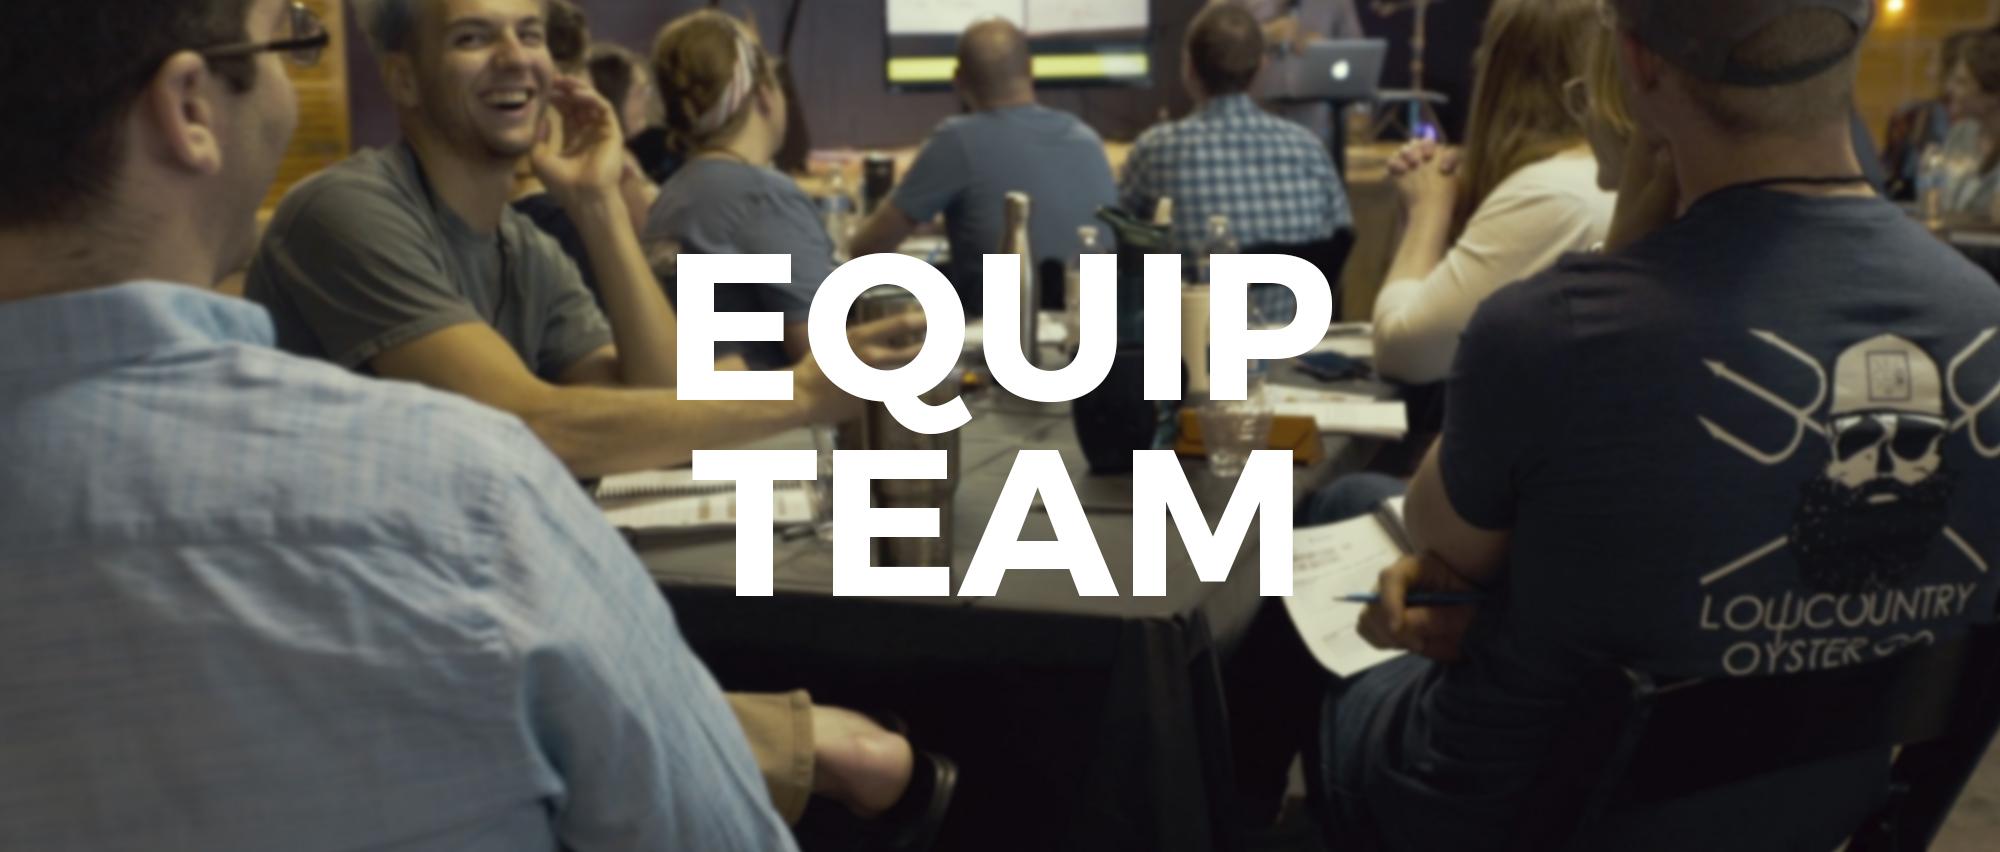 Equip Team.jpg